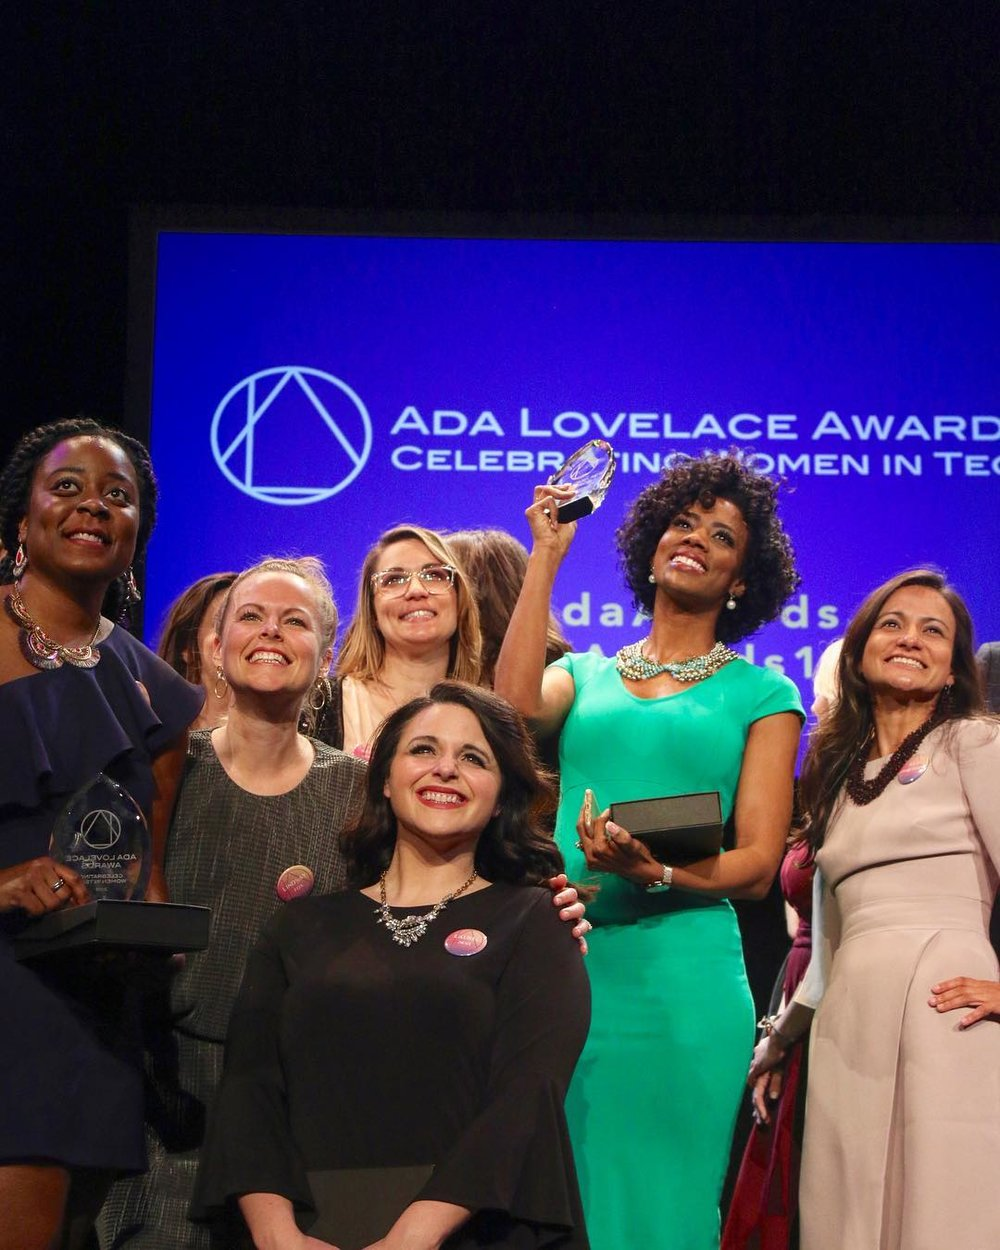 Meet the winners! - The 2019 Ada Lovelace Award winners are Nashlie Sephus, PhD, Julie Cwikla PhD, Laurel Hess, Lynsey Jordan Gwin, Rebekah E. Wilke, and Courtney Caldwell.